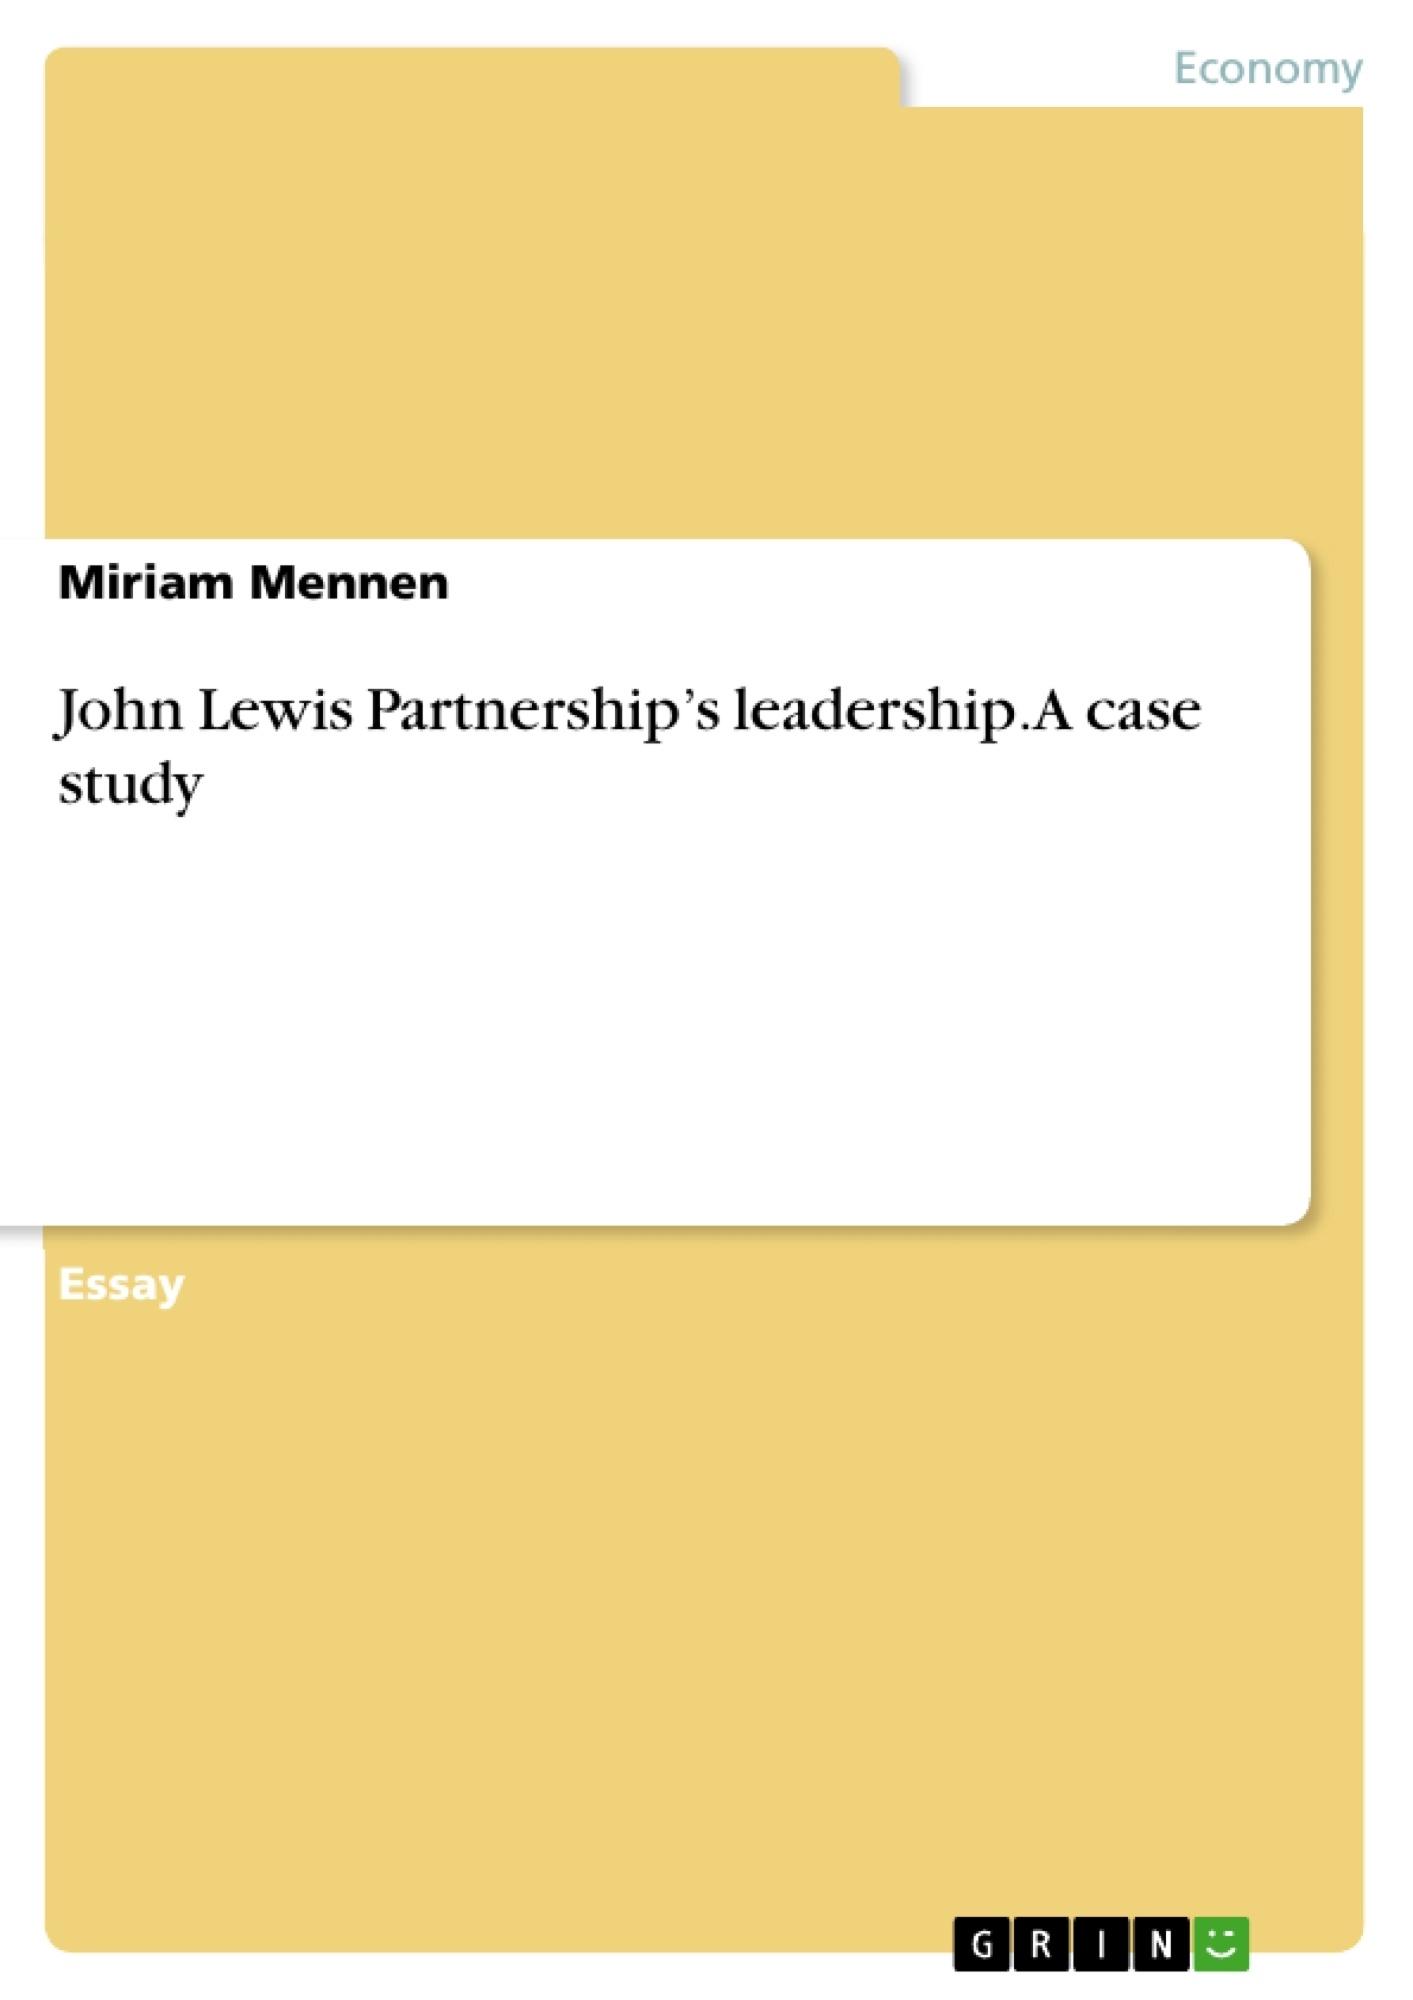 Title: John Lewis Partnership's leadership. A case study